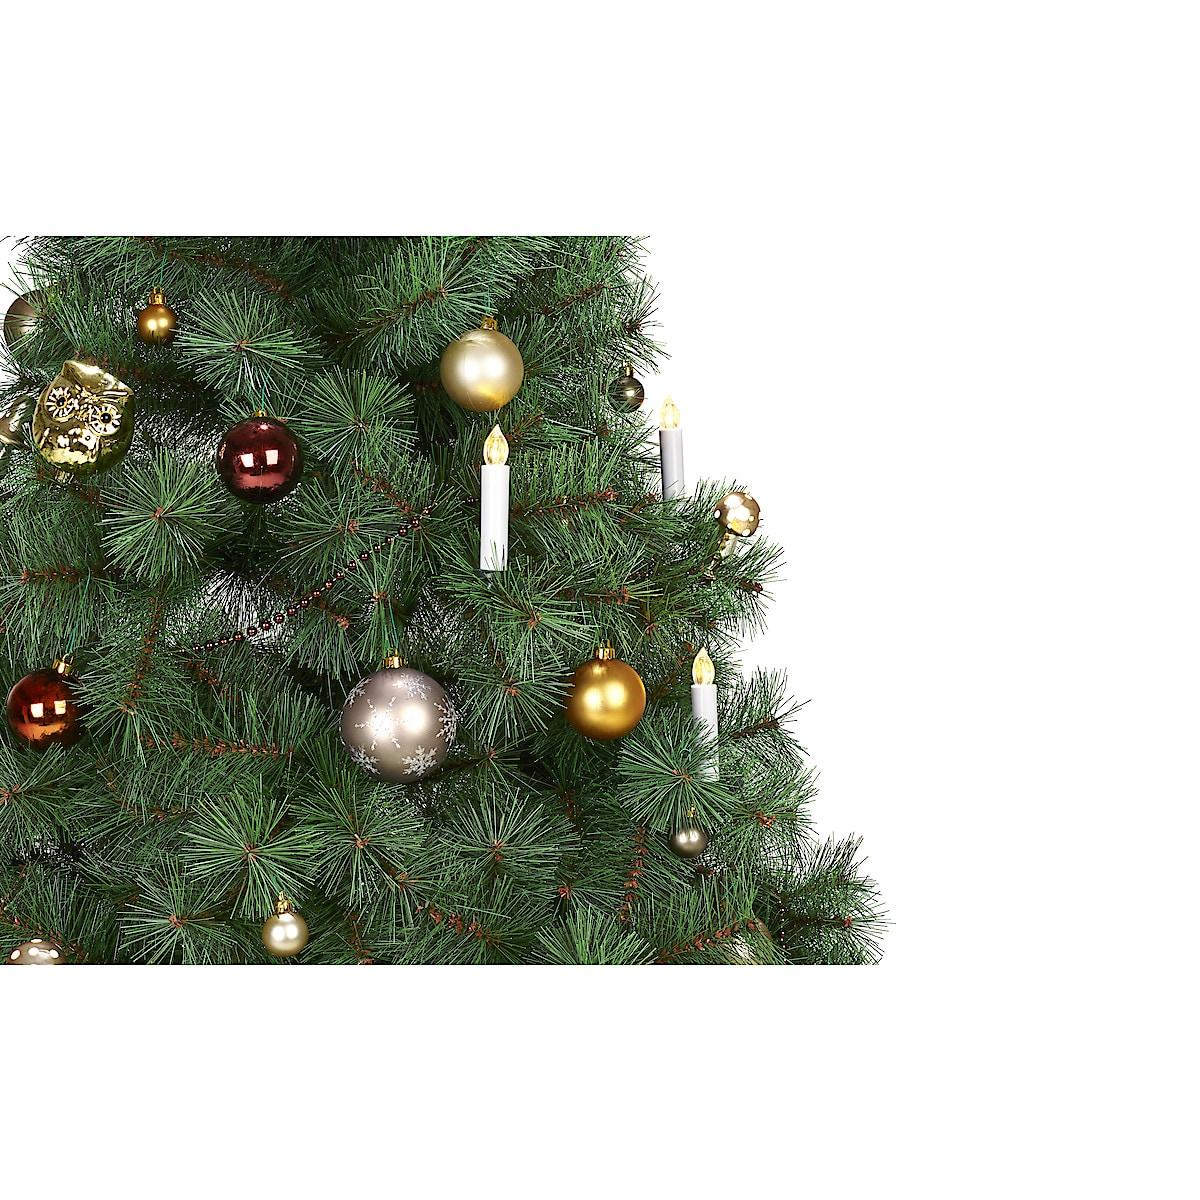 Trådløs juletrebelysning med fjernkontroll